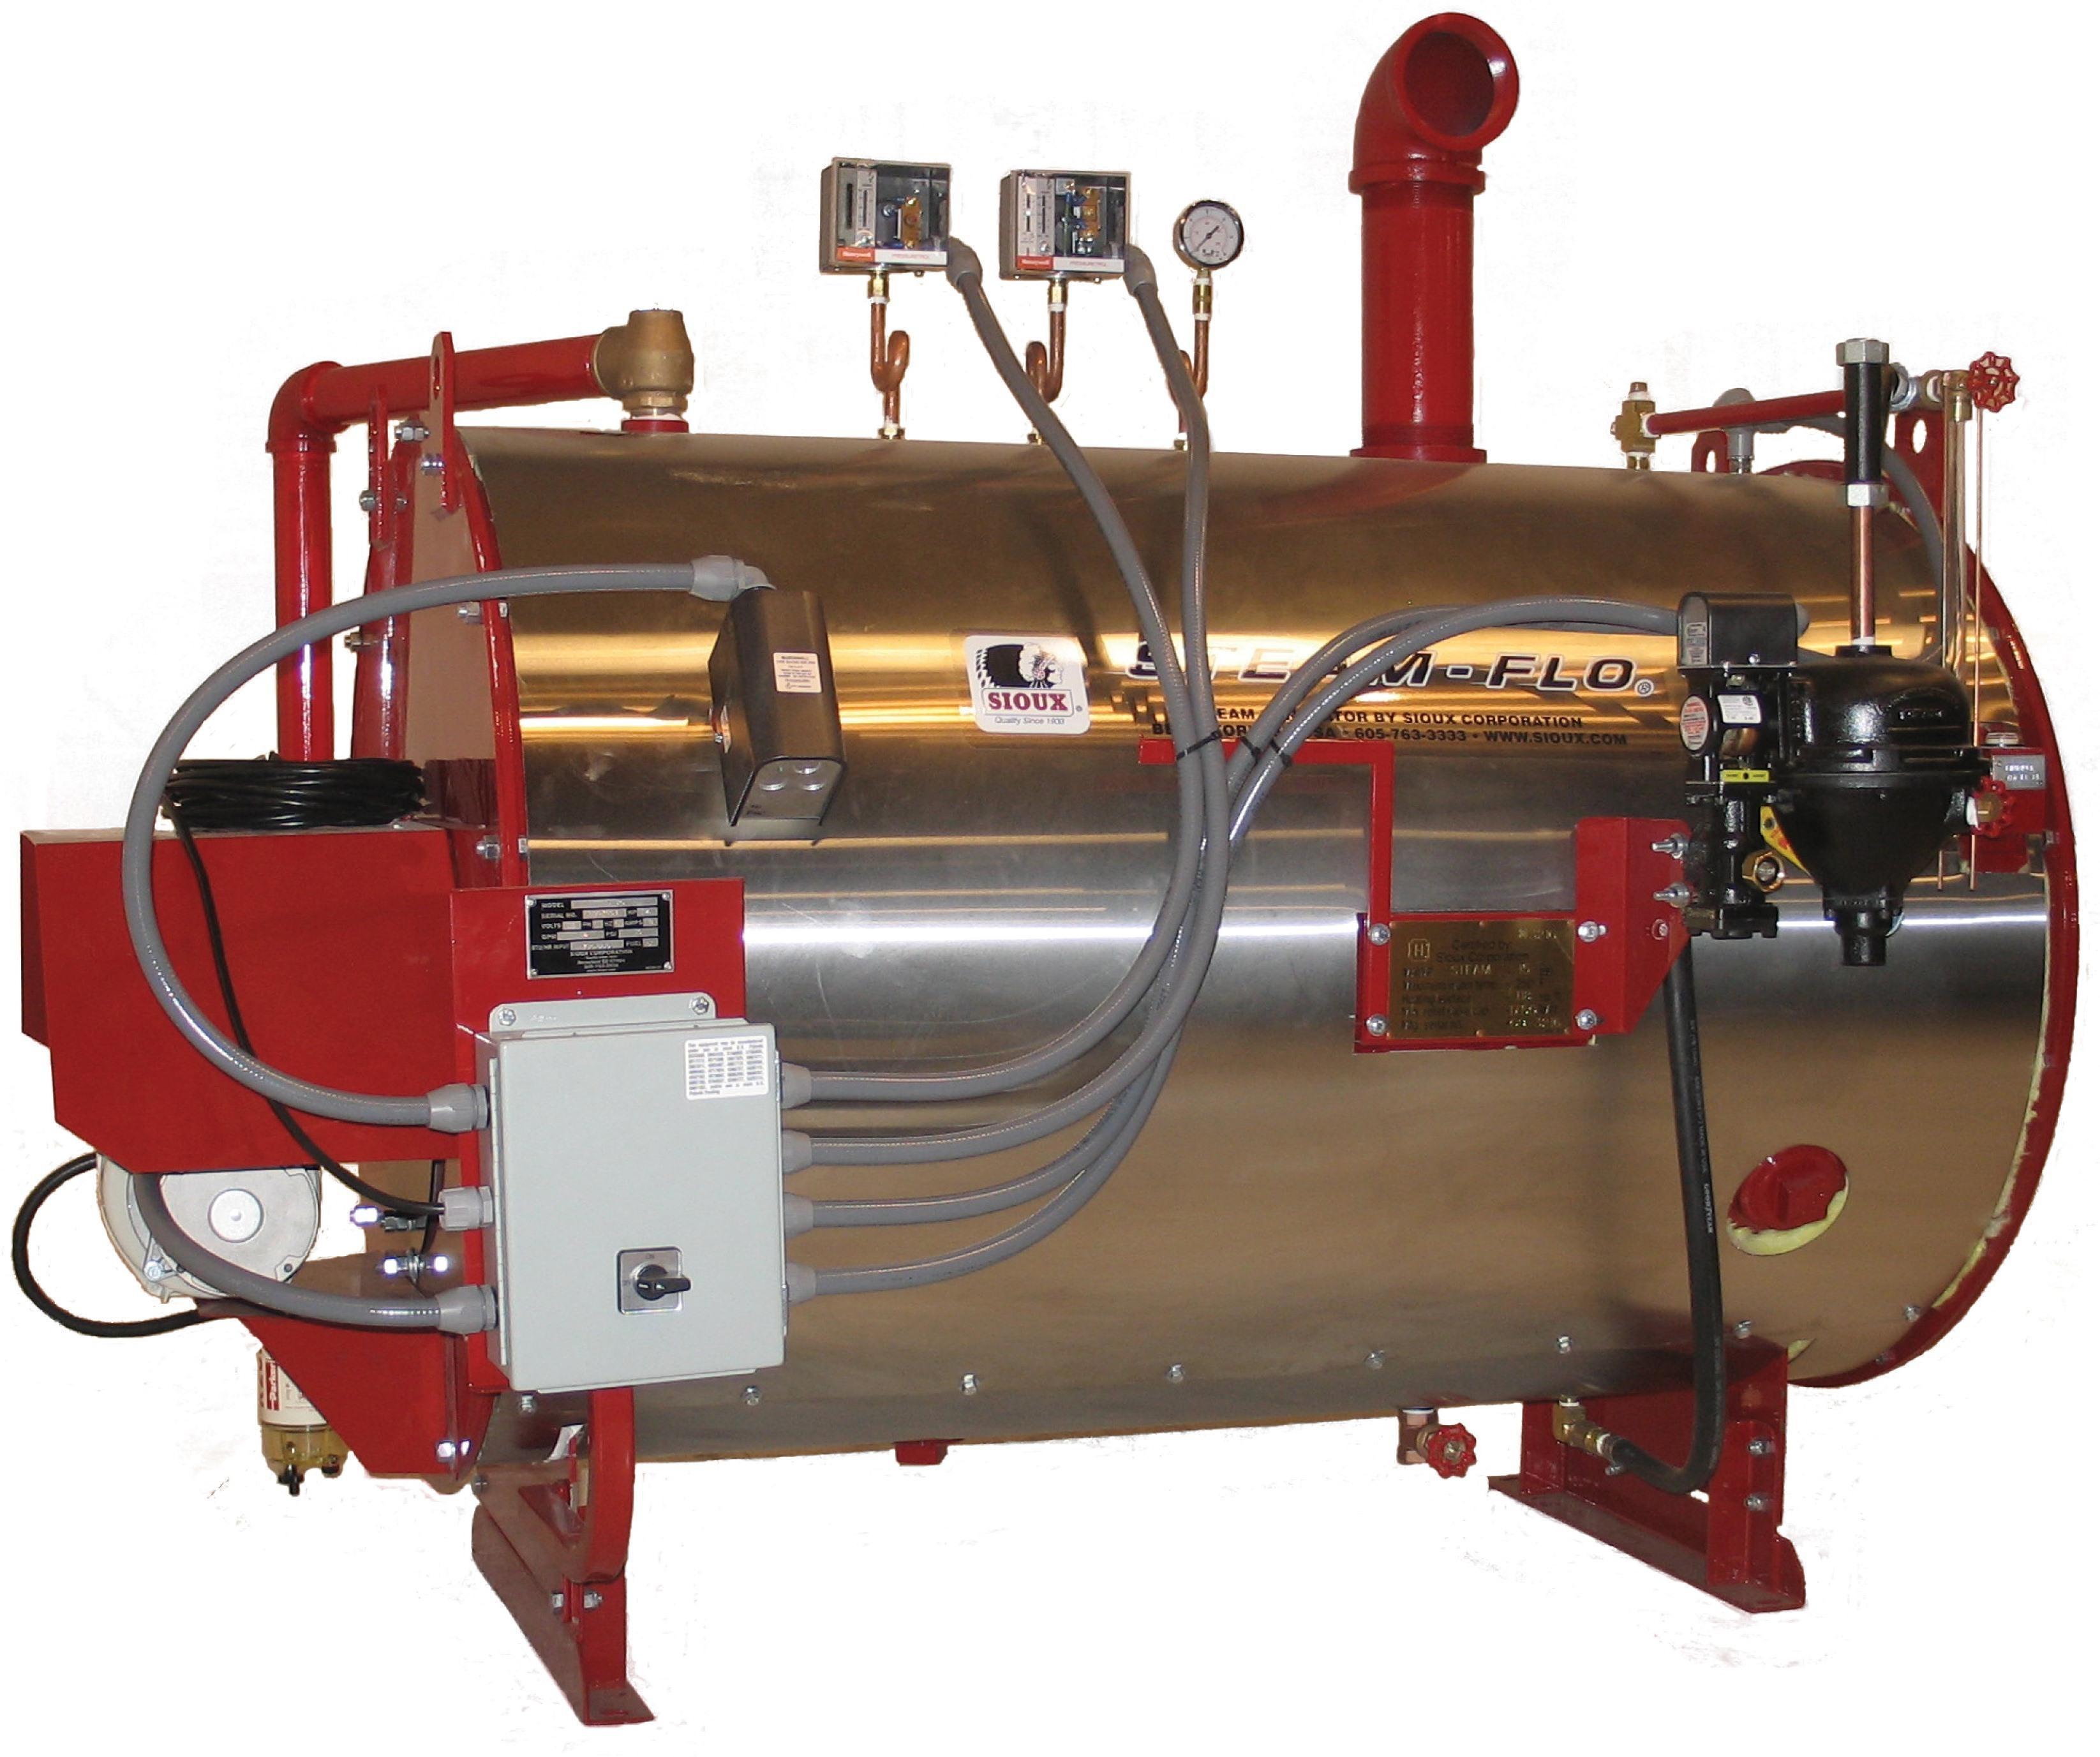 Sioux touts steam generator